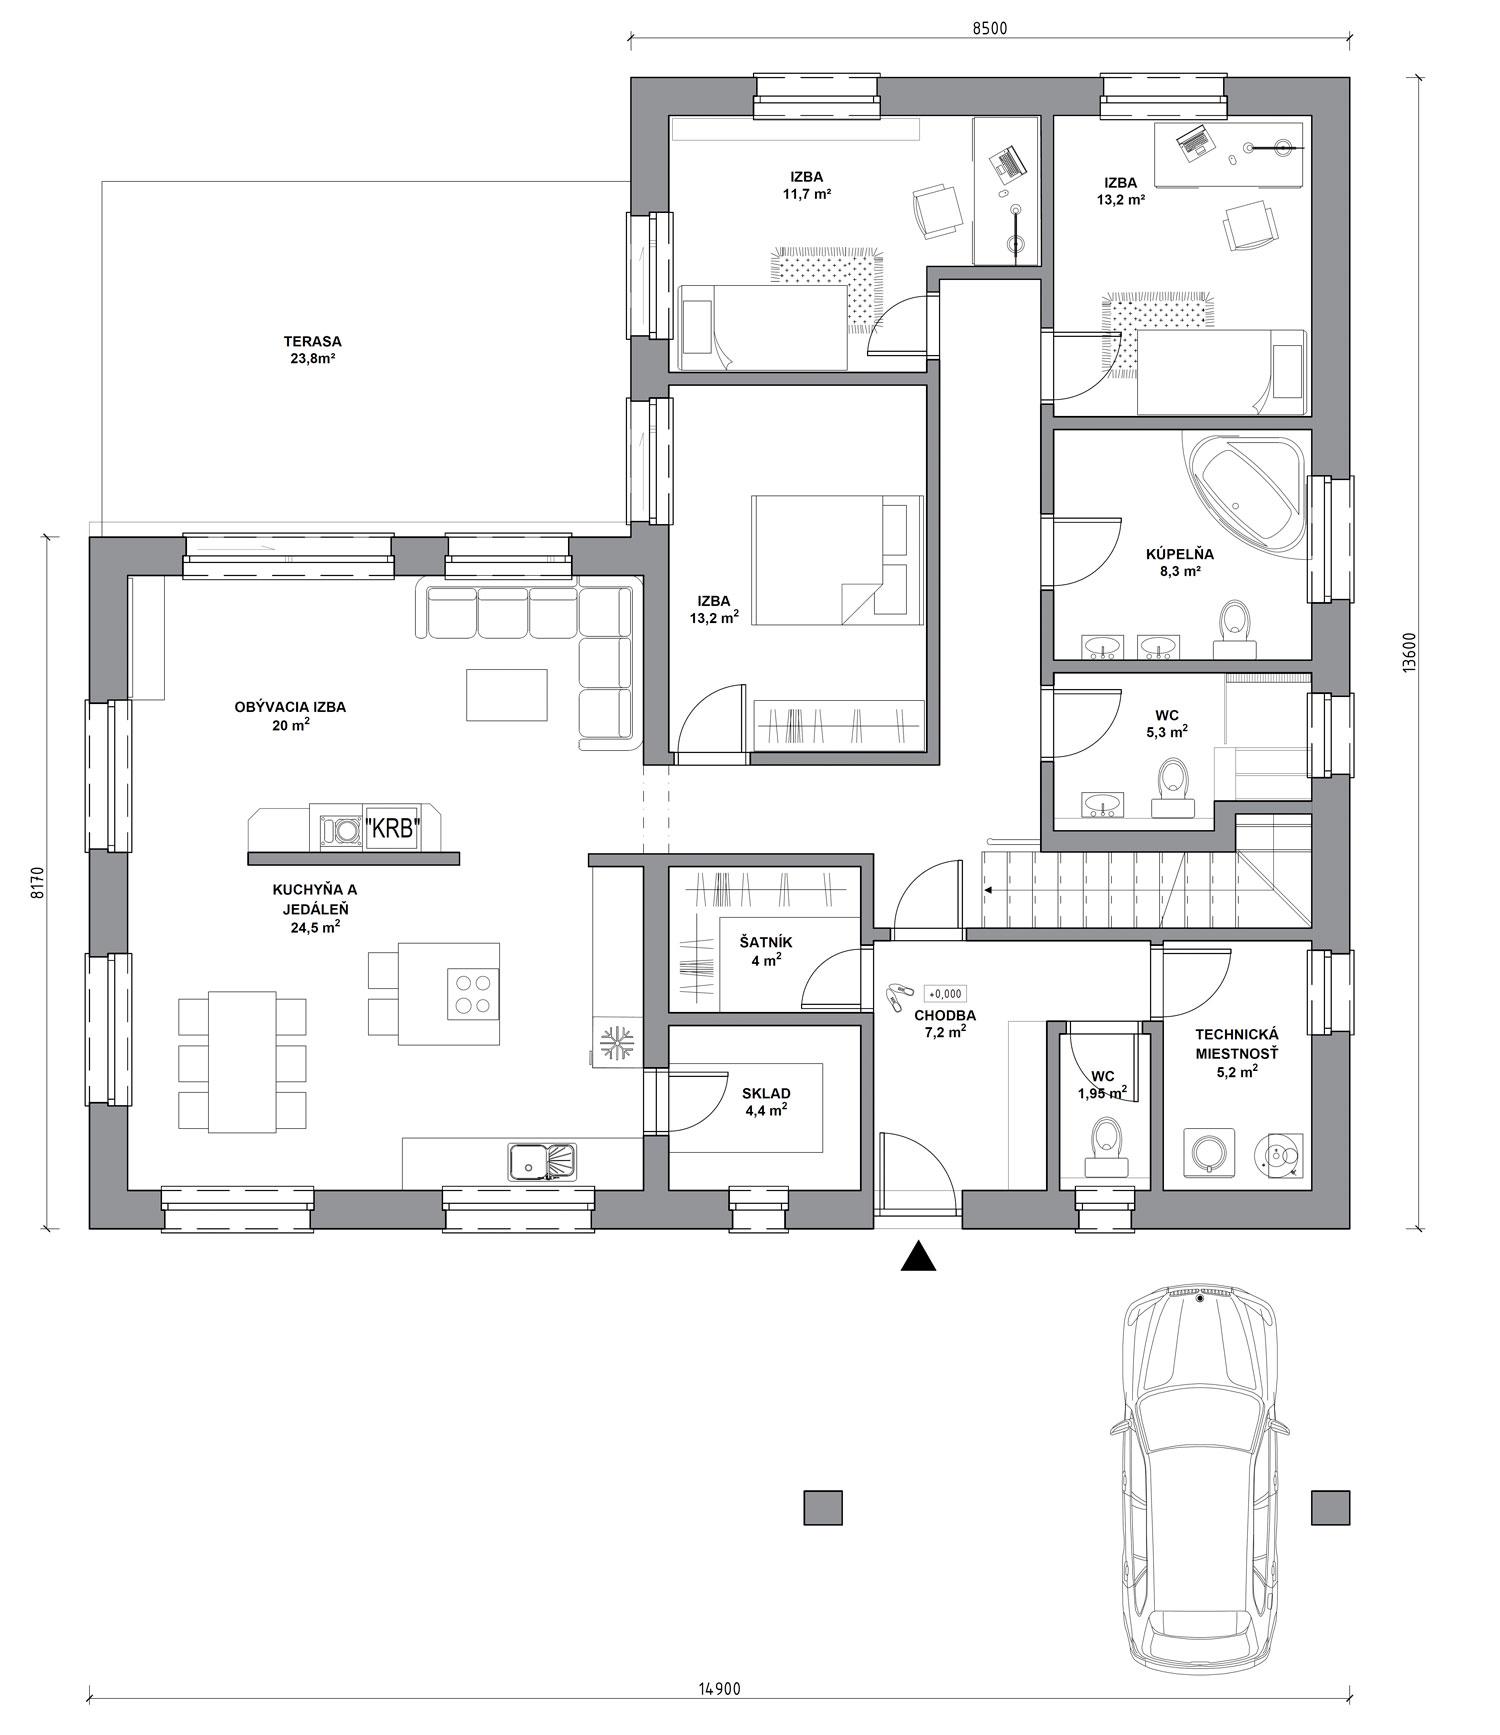 yard-projekt-rodinny-dom-krupina-04